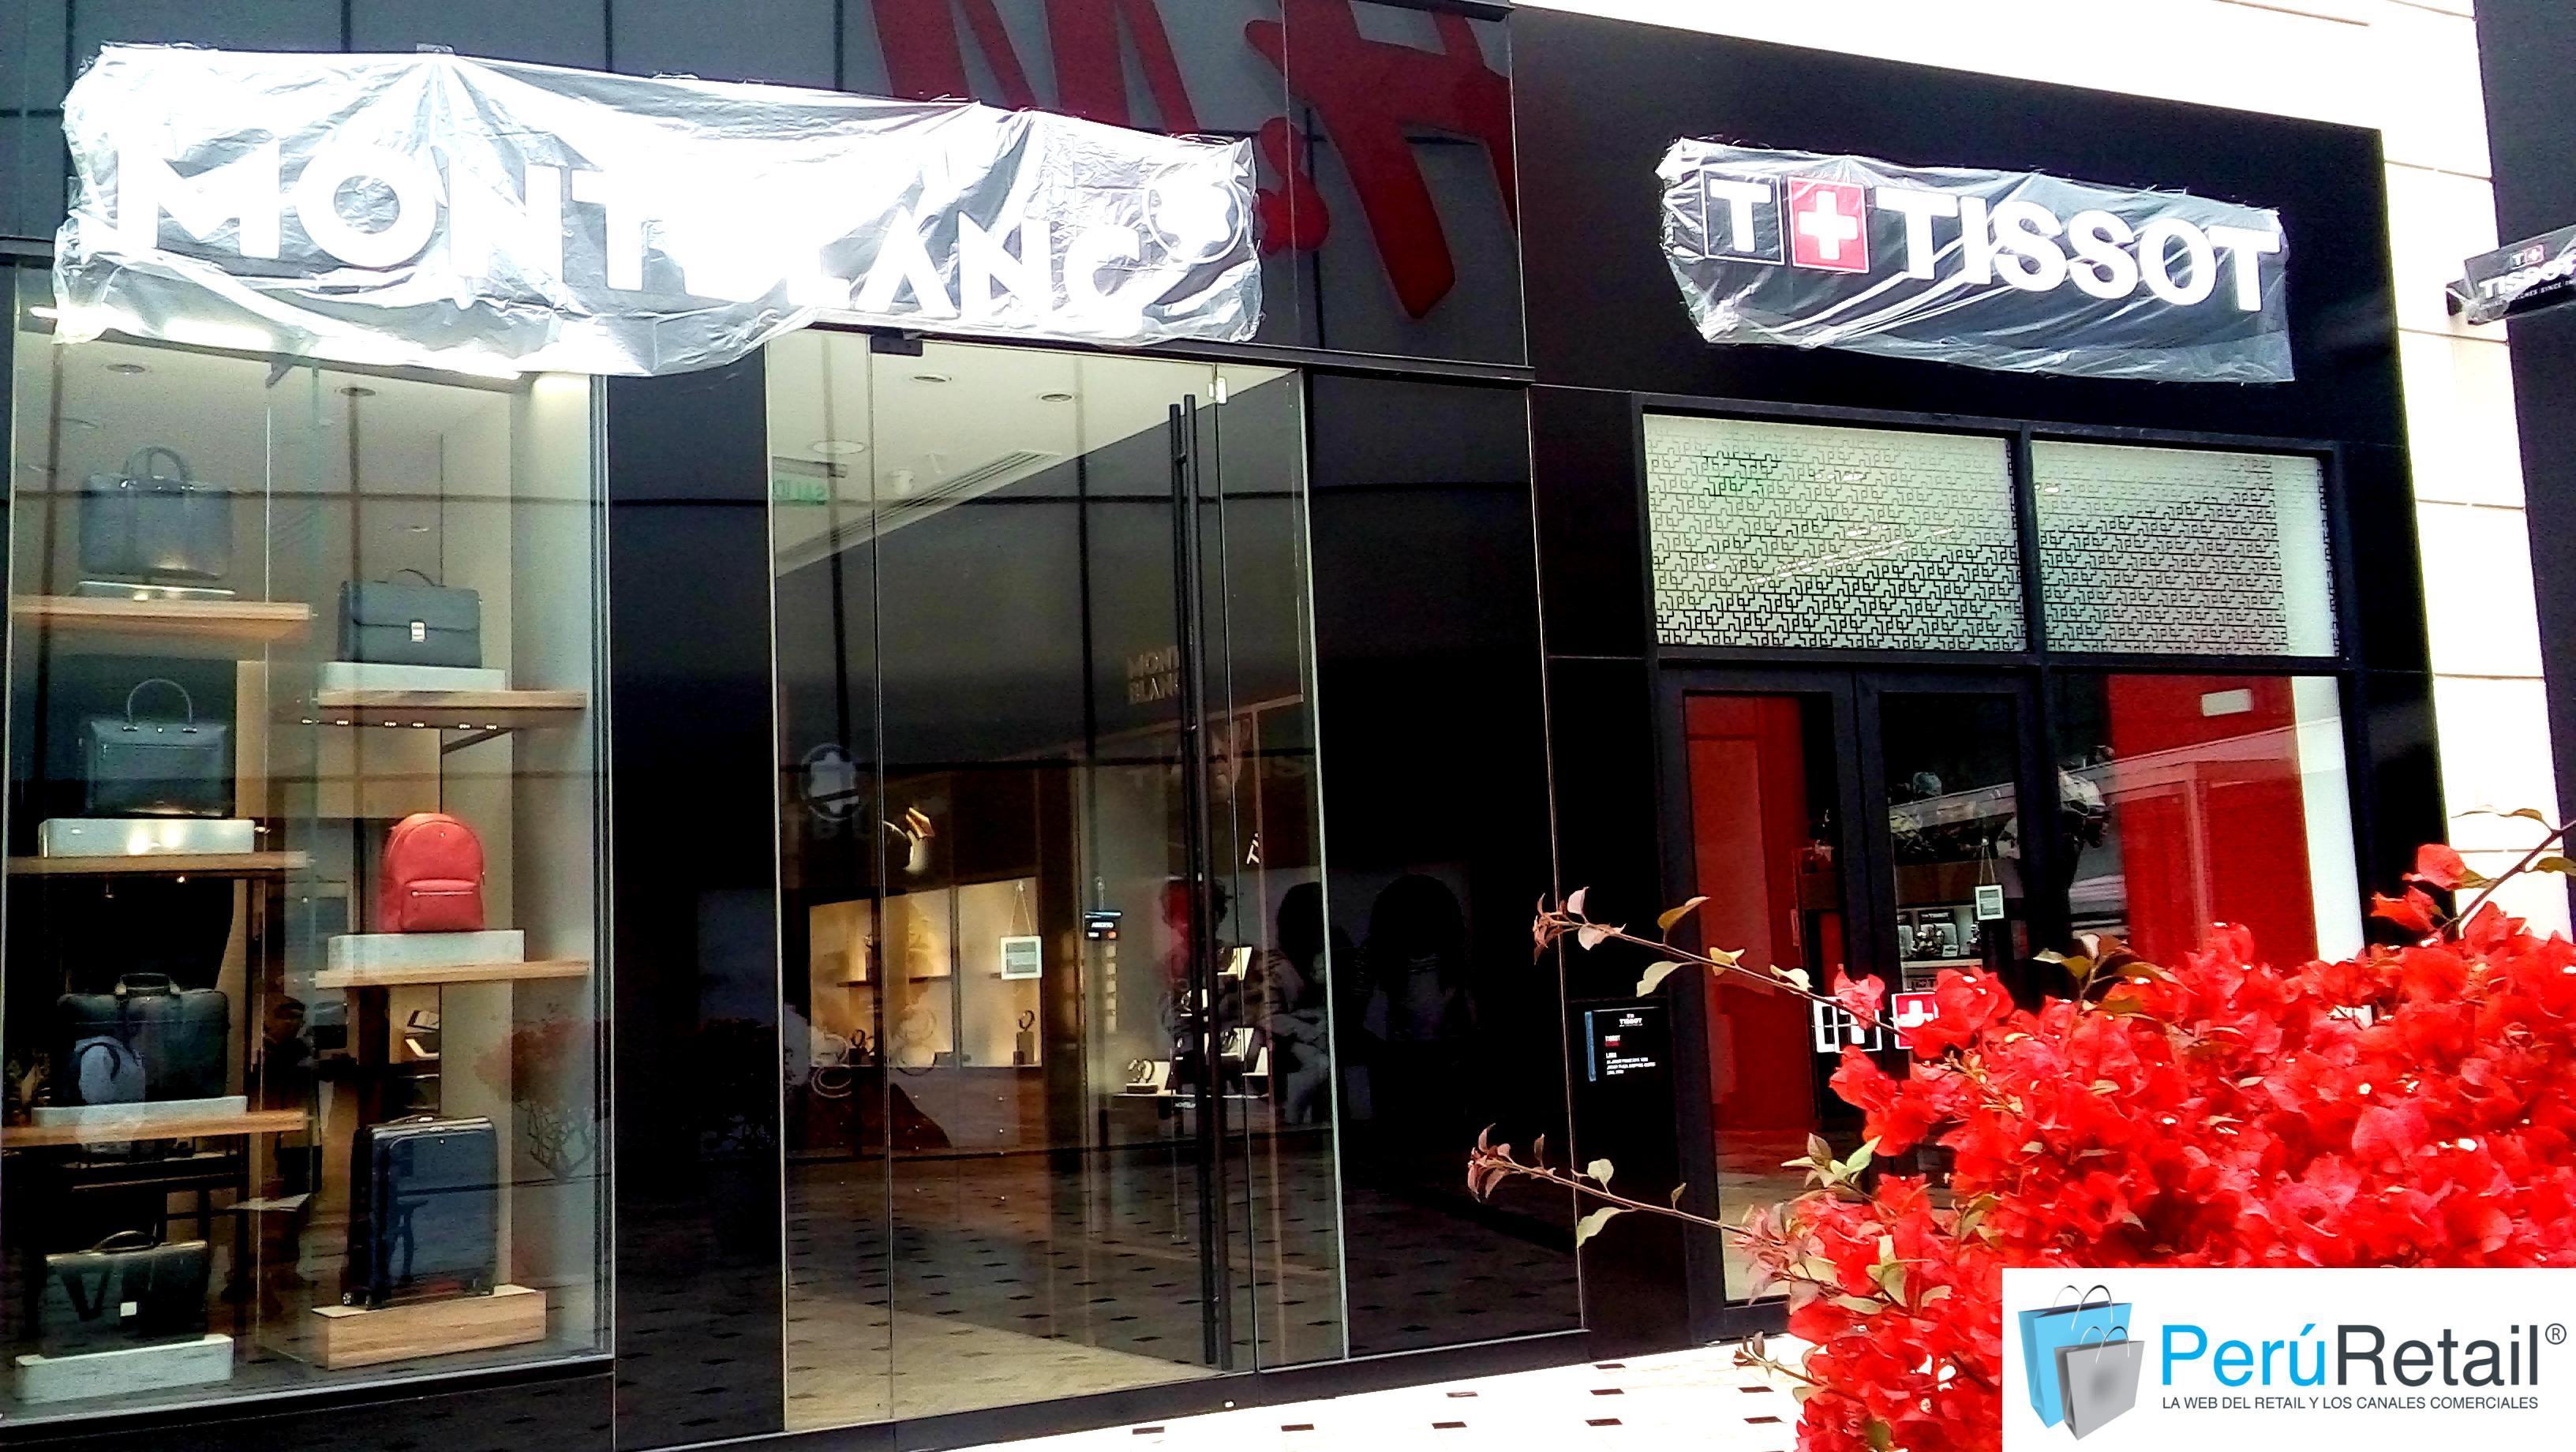 MontBlanc y Tissot 1 Peru Retail - G&G Joyeros invierte US$ 400,000 para abrir Tissot y Montblanc en Perú